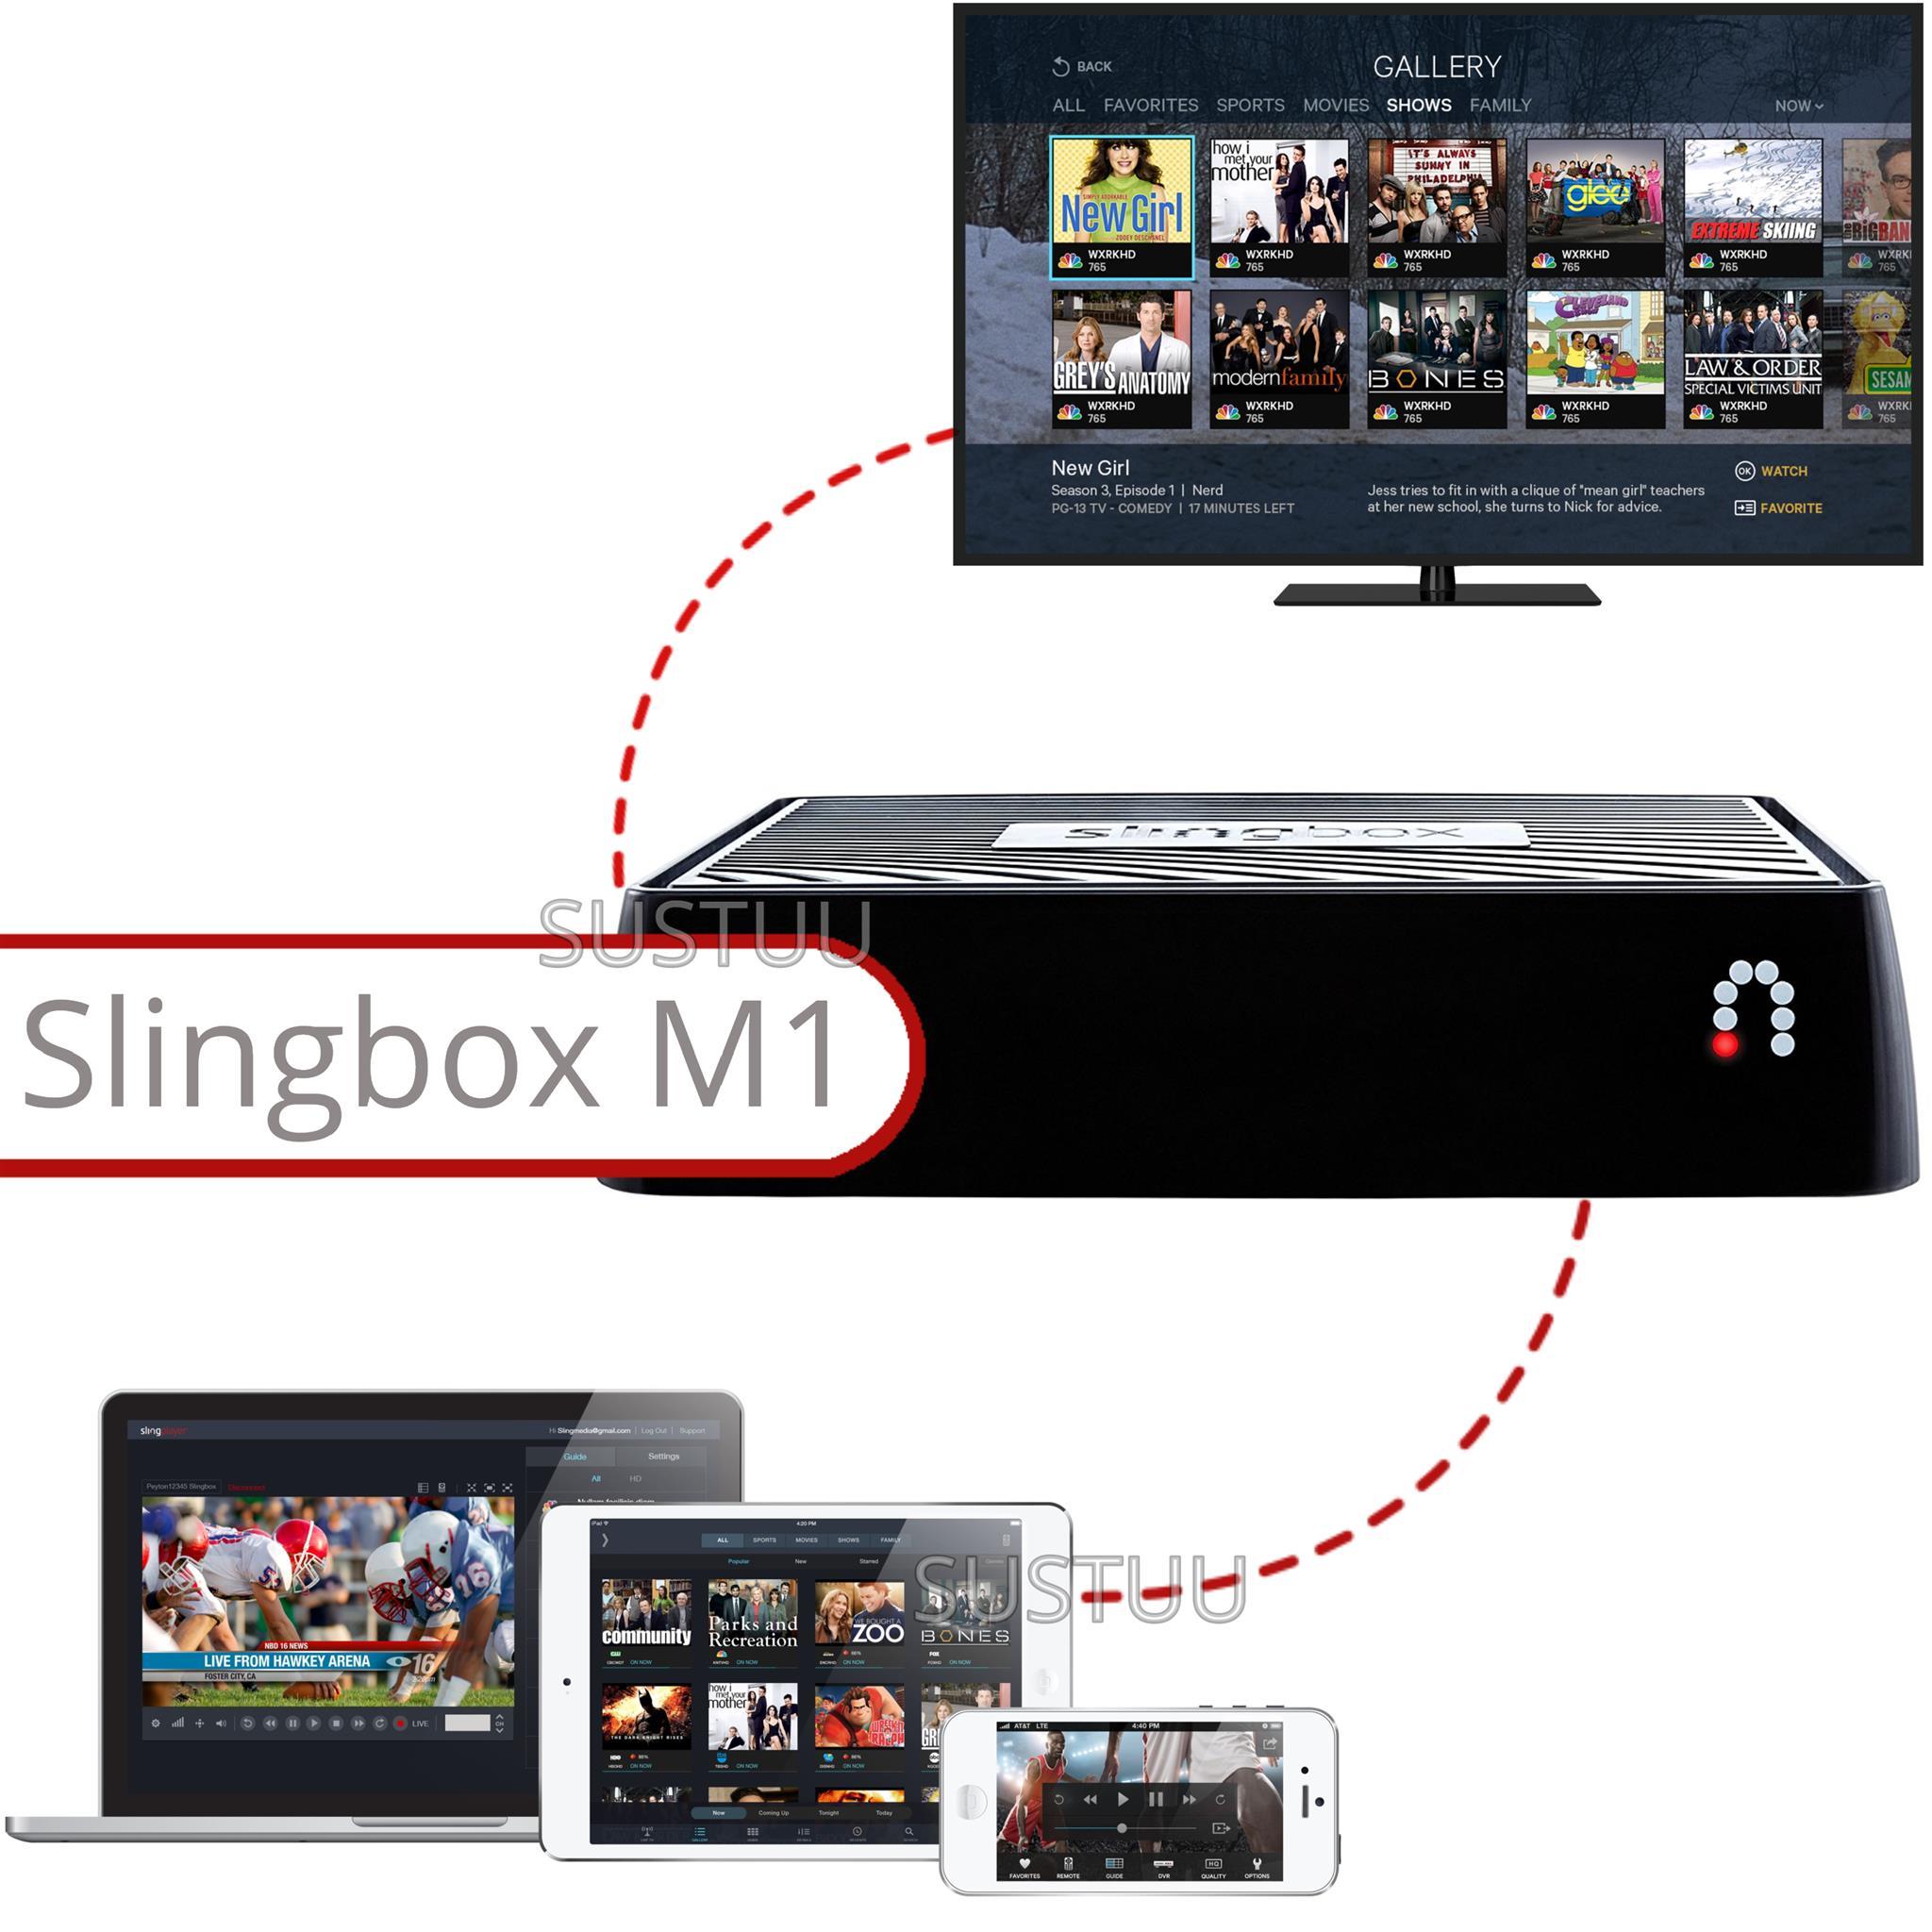 Slingbox M1 Digital Media Receiver TV Box | WiFi Connectivity & Ethernet Port | NEW